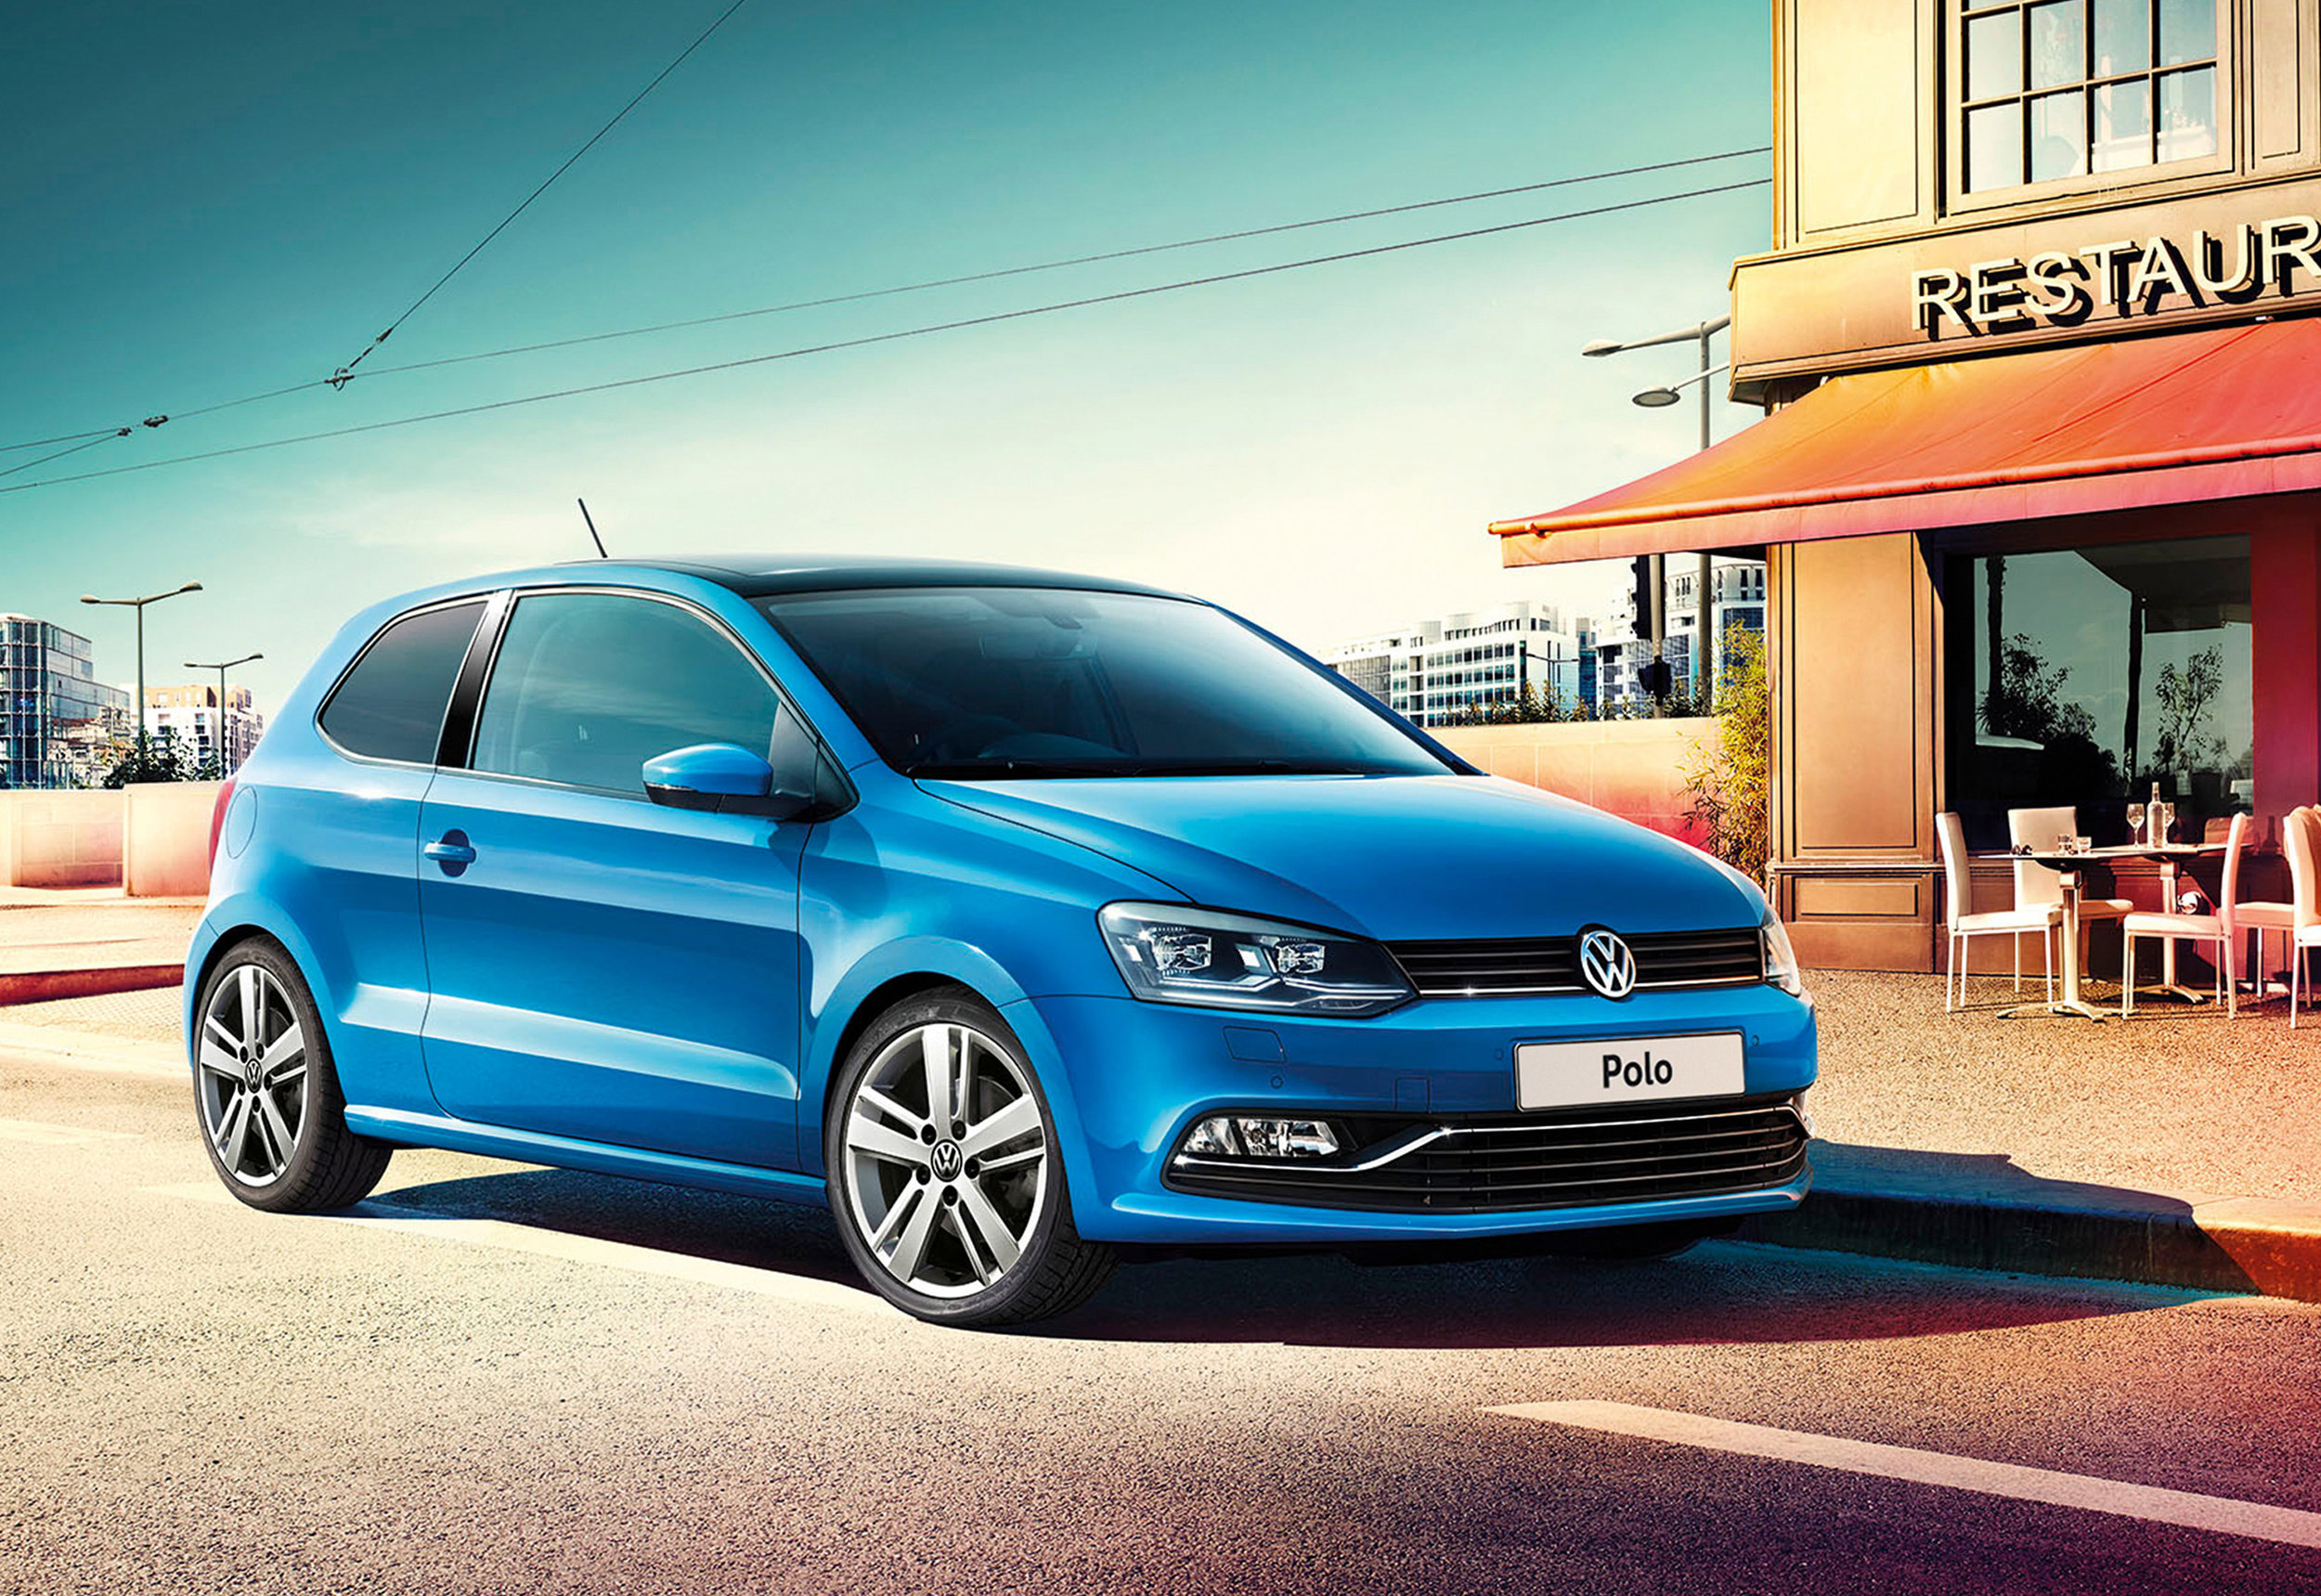 Volkswagen-Polo-Match-Edition-1.jpg